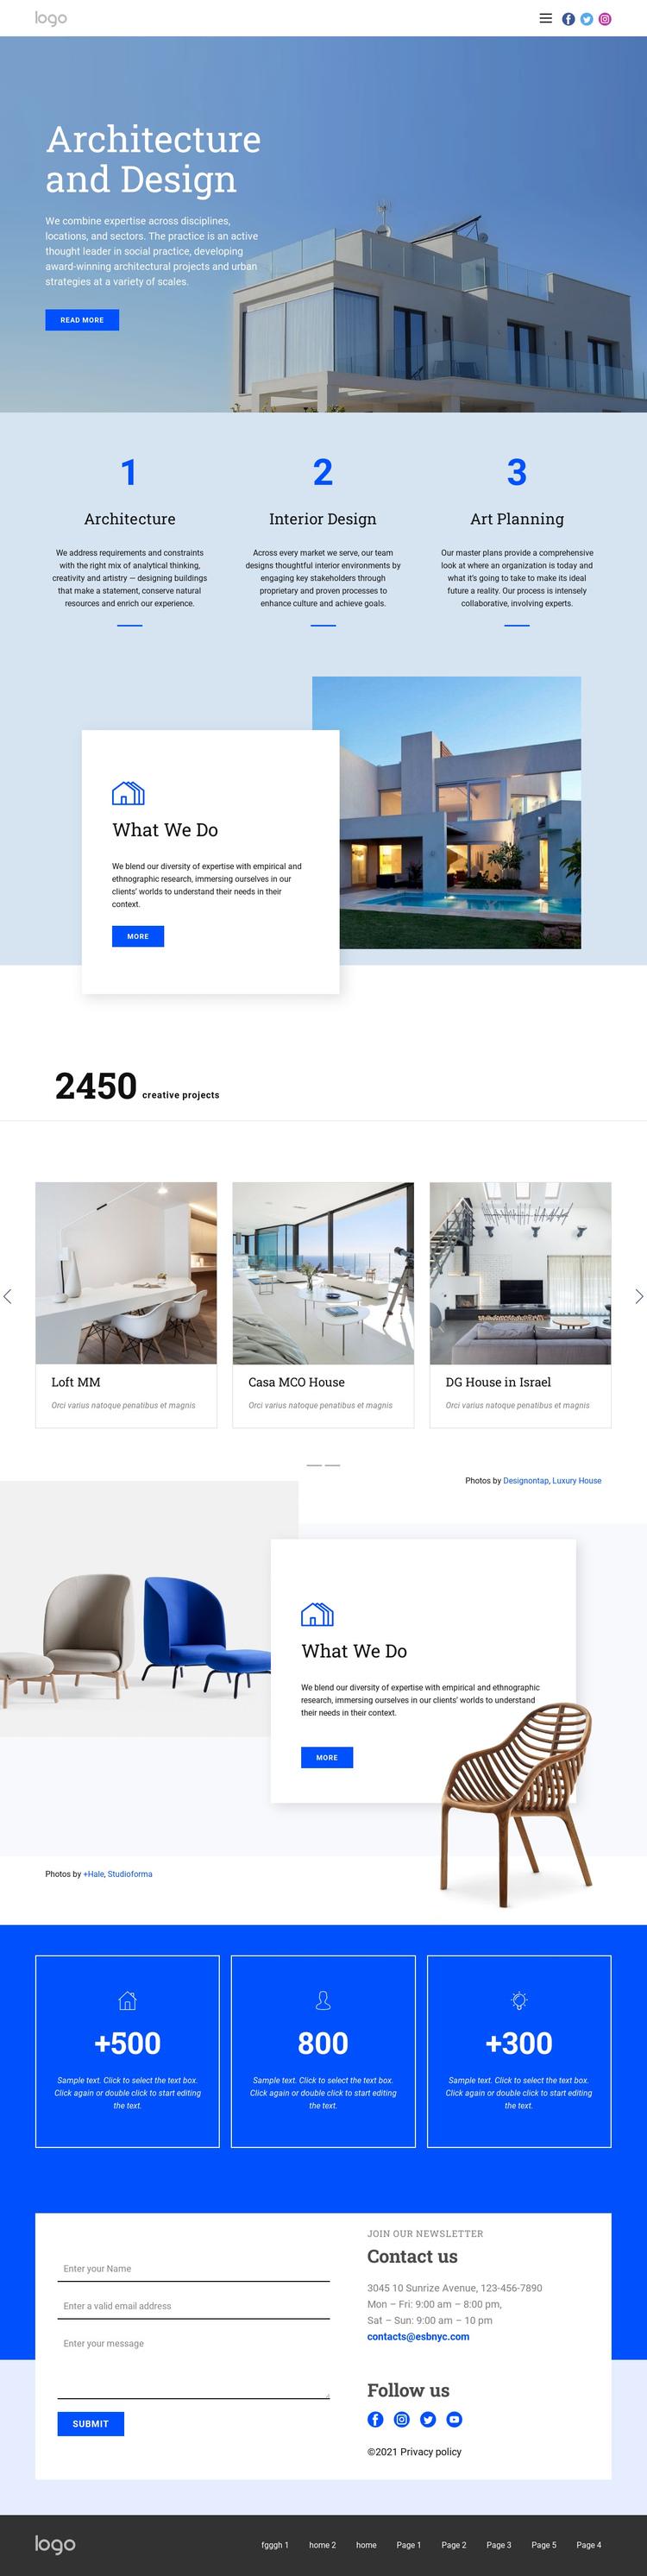 Architecture and design Website Builder Software